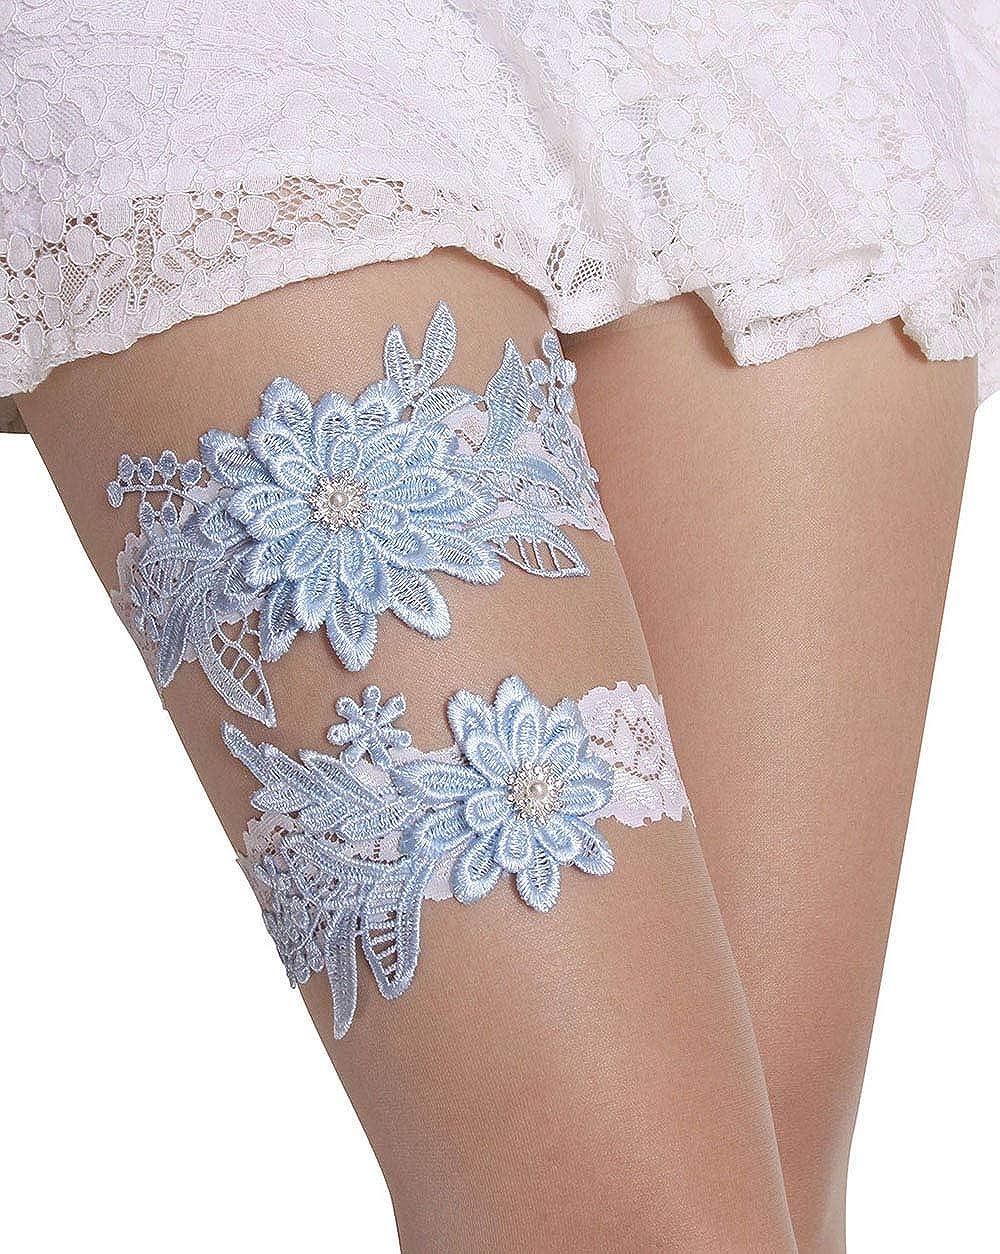 GARGALA Wedding Garters half for Bride Credence Bridal Lace Rh Garter Set with